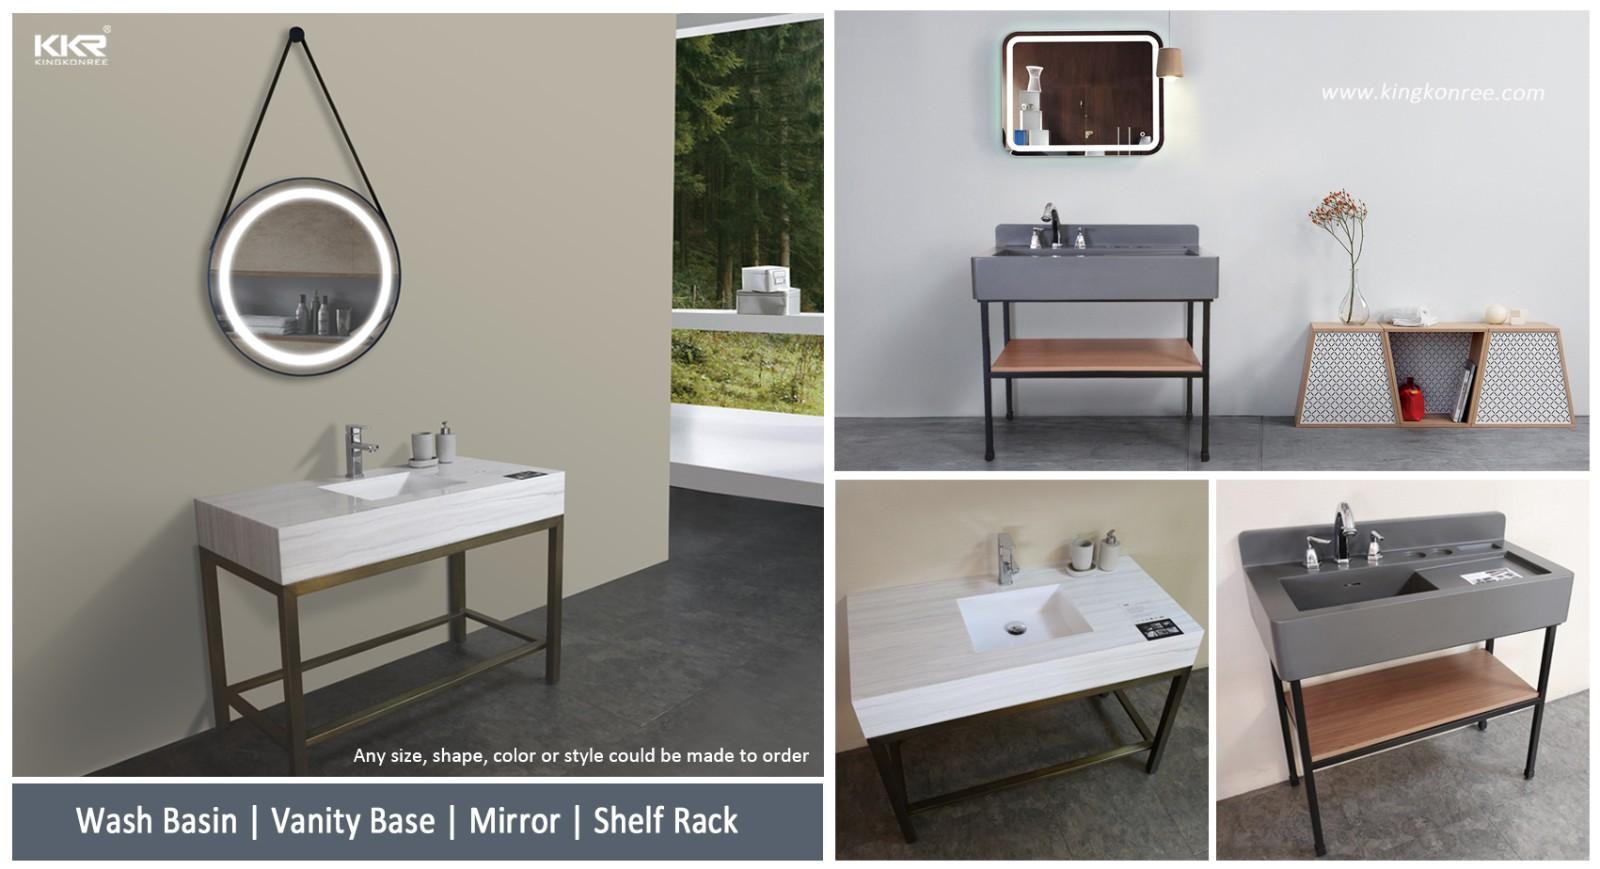 durable custom vanity tops customized for hotel-1